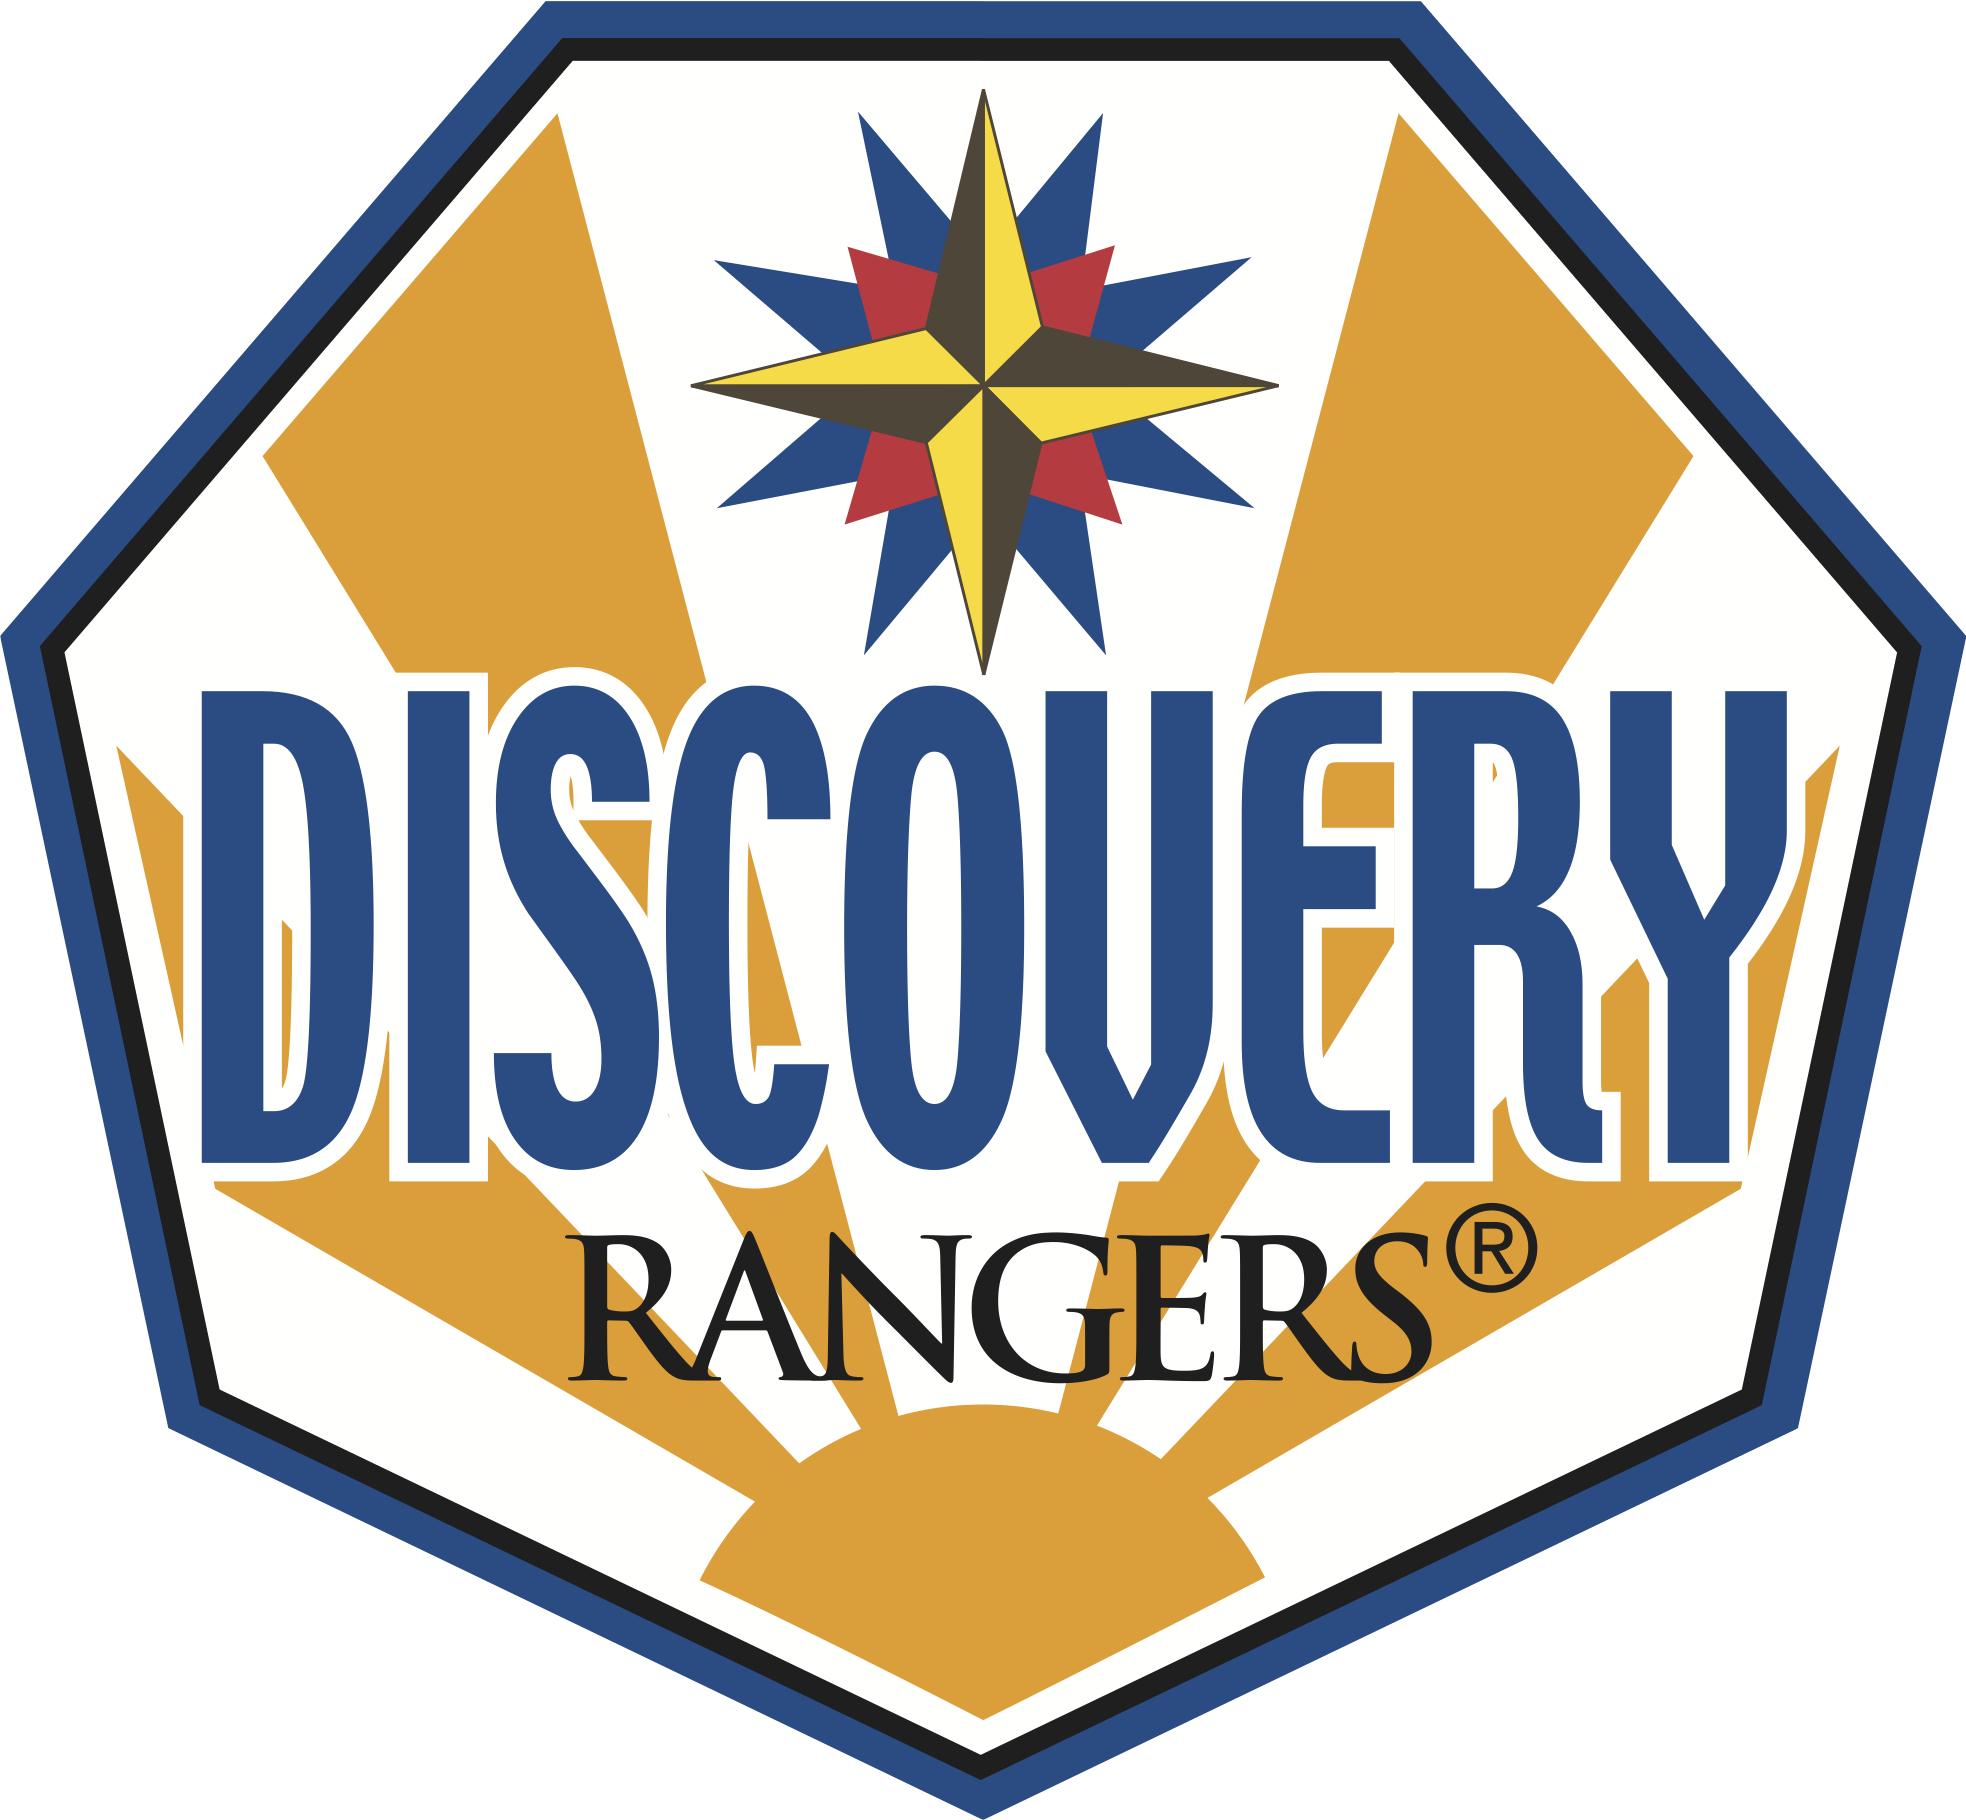 discovery rangers copy 2.jpg